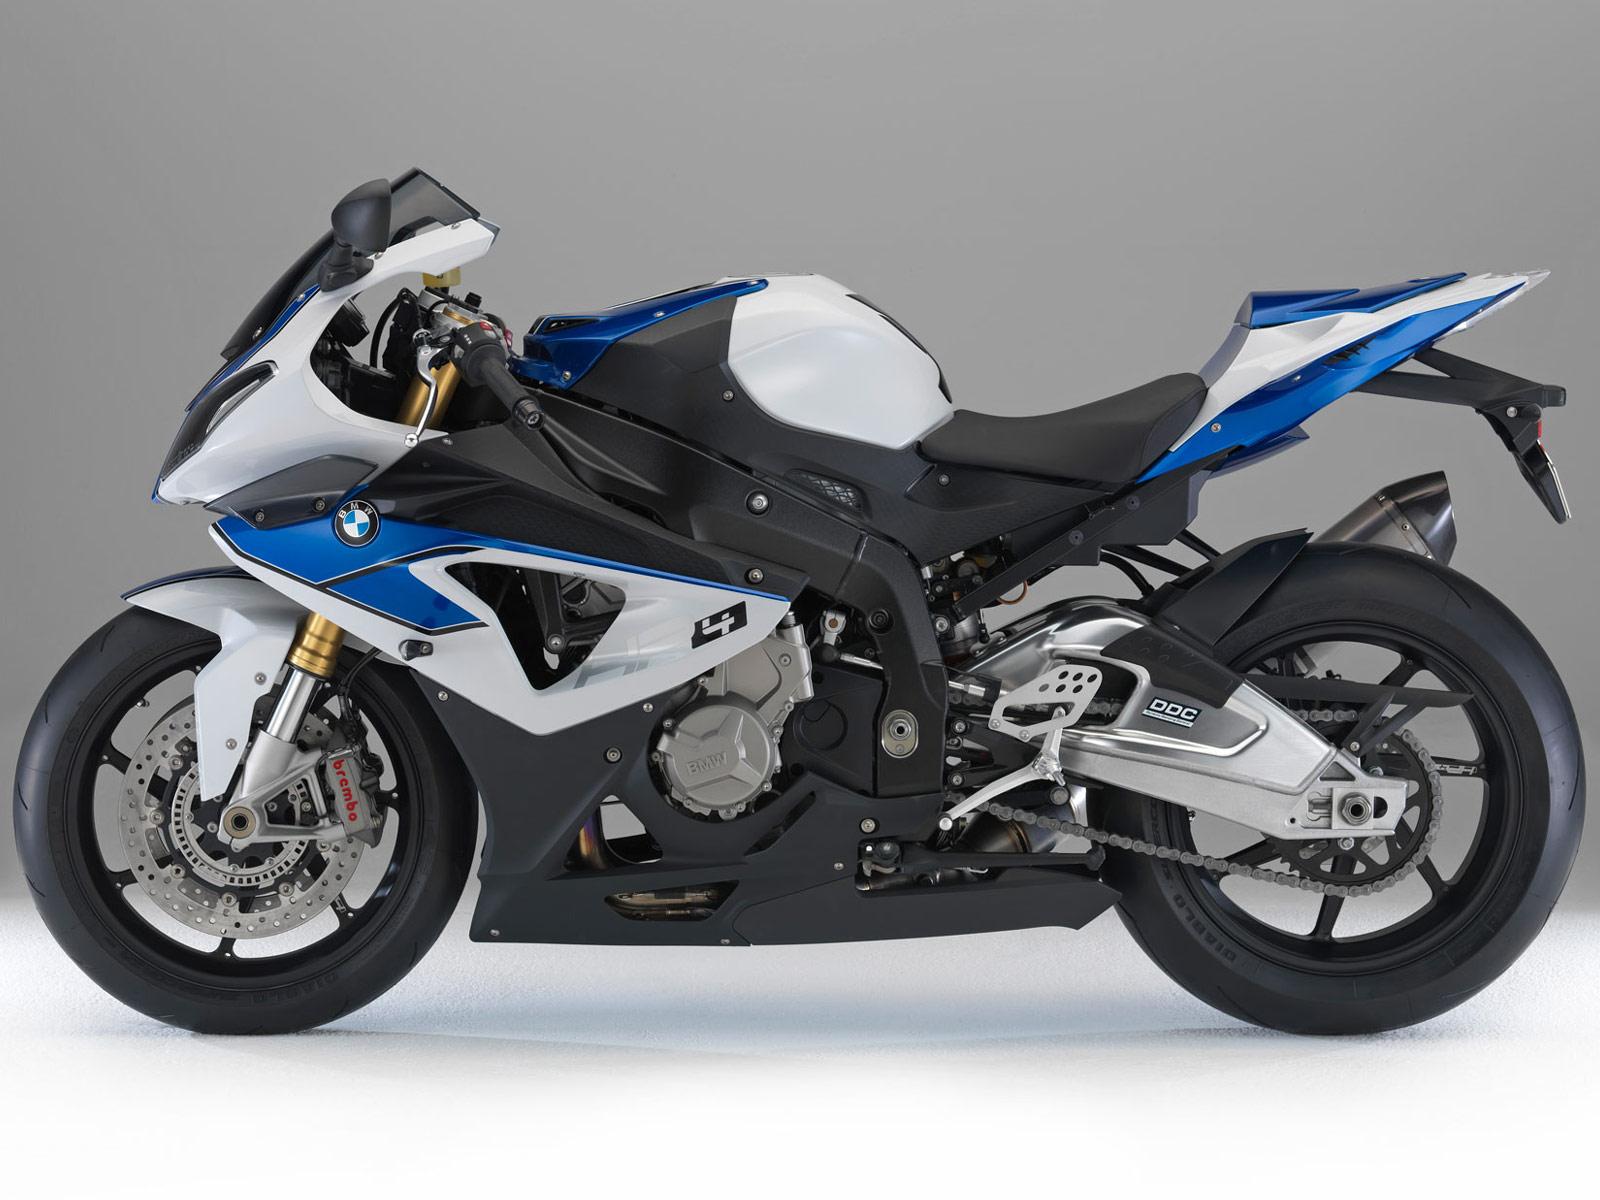 2013 BMW HP4 motorcy